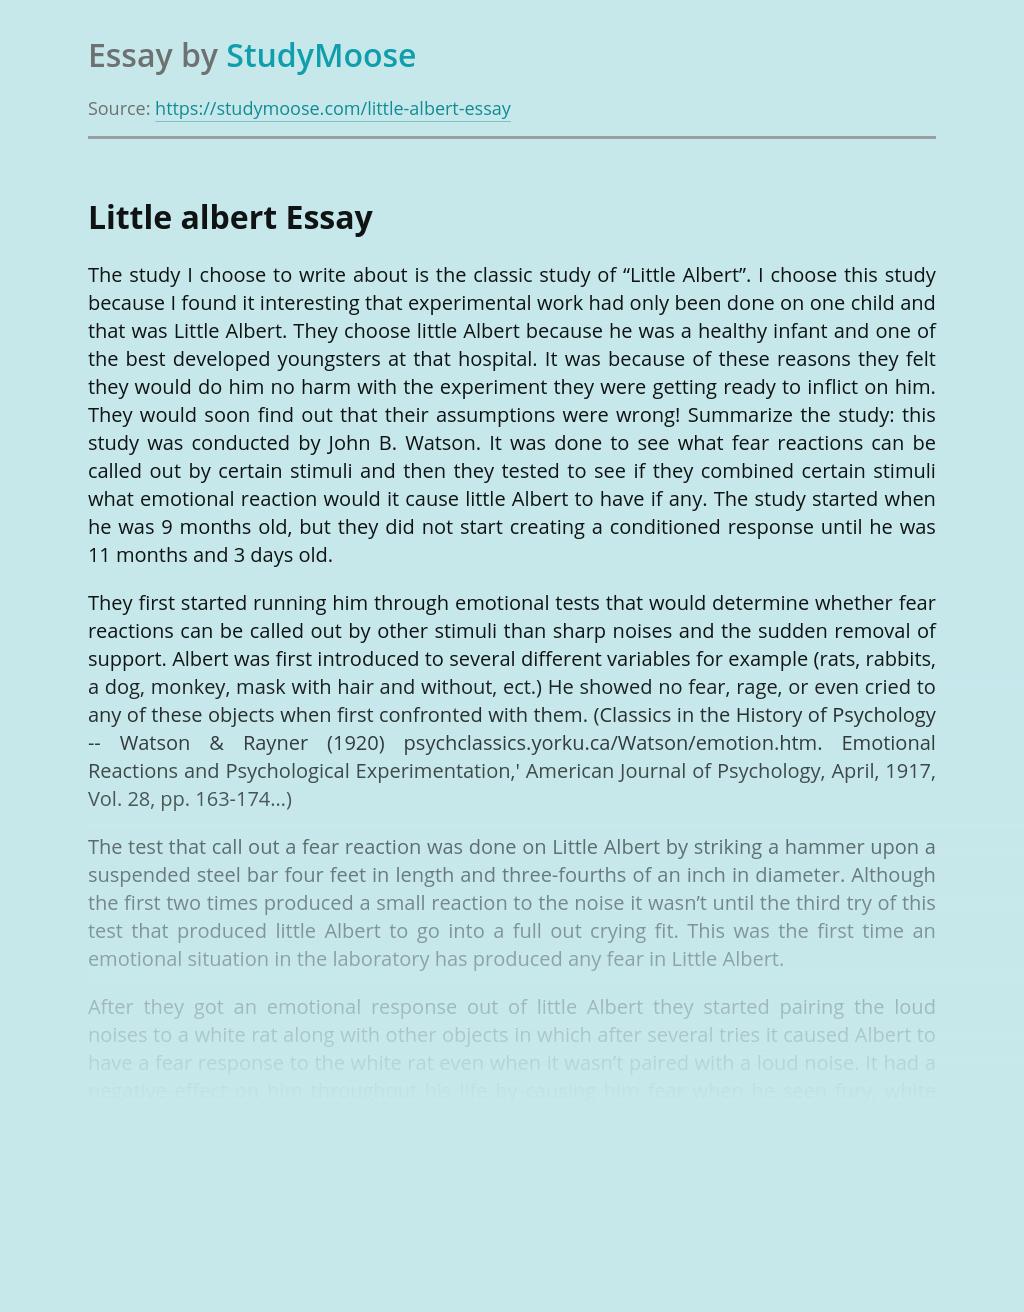 Classic Study of Little Albert Research